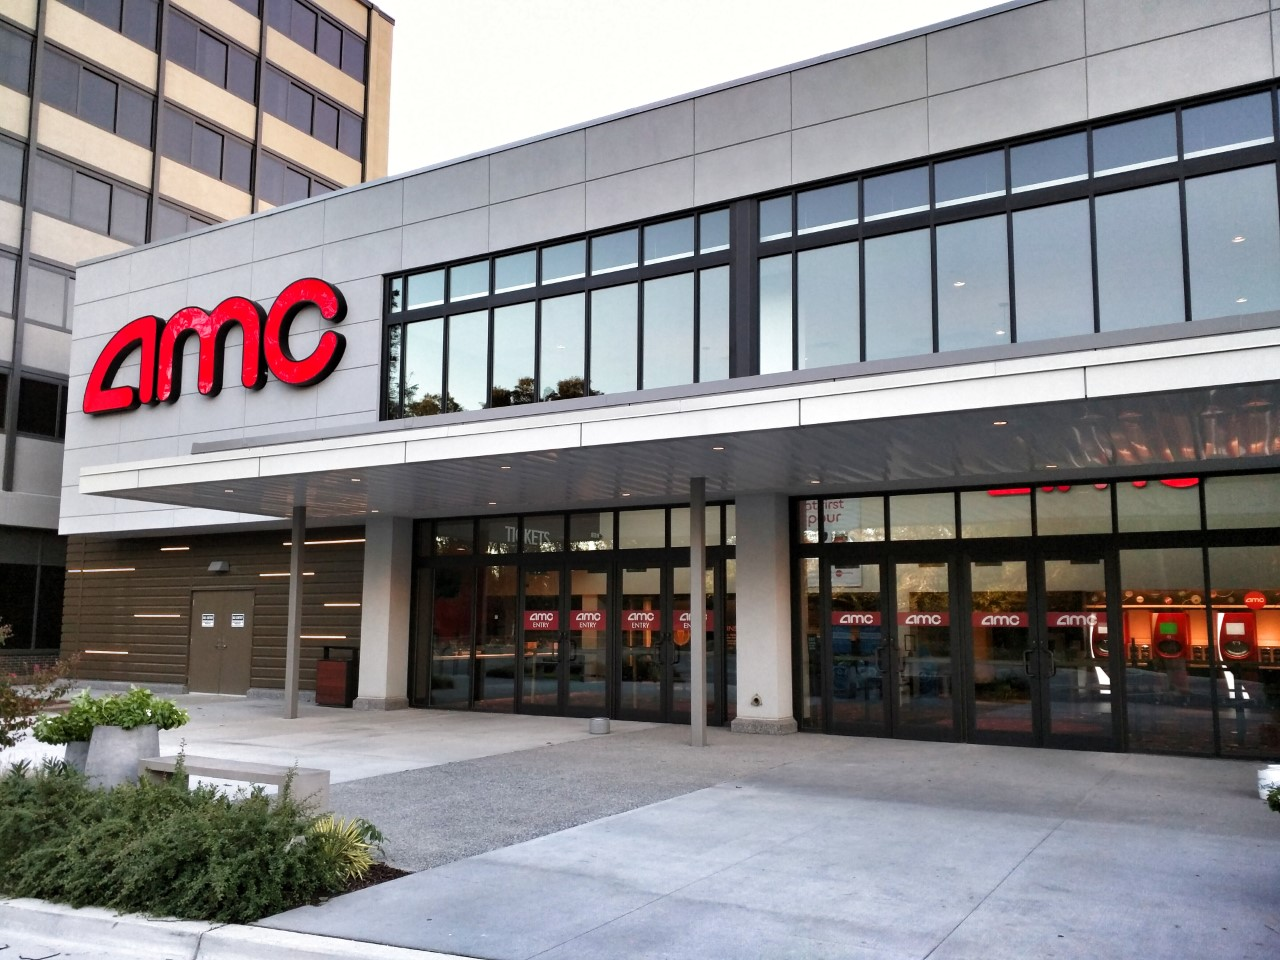 East moco amc wheaton 9 cineplex opens at wheaton plaza photos for Amc theatres garden state plaza